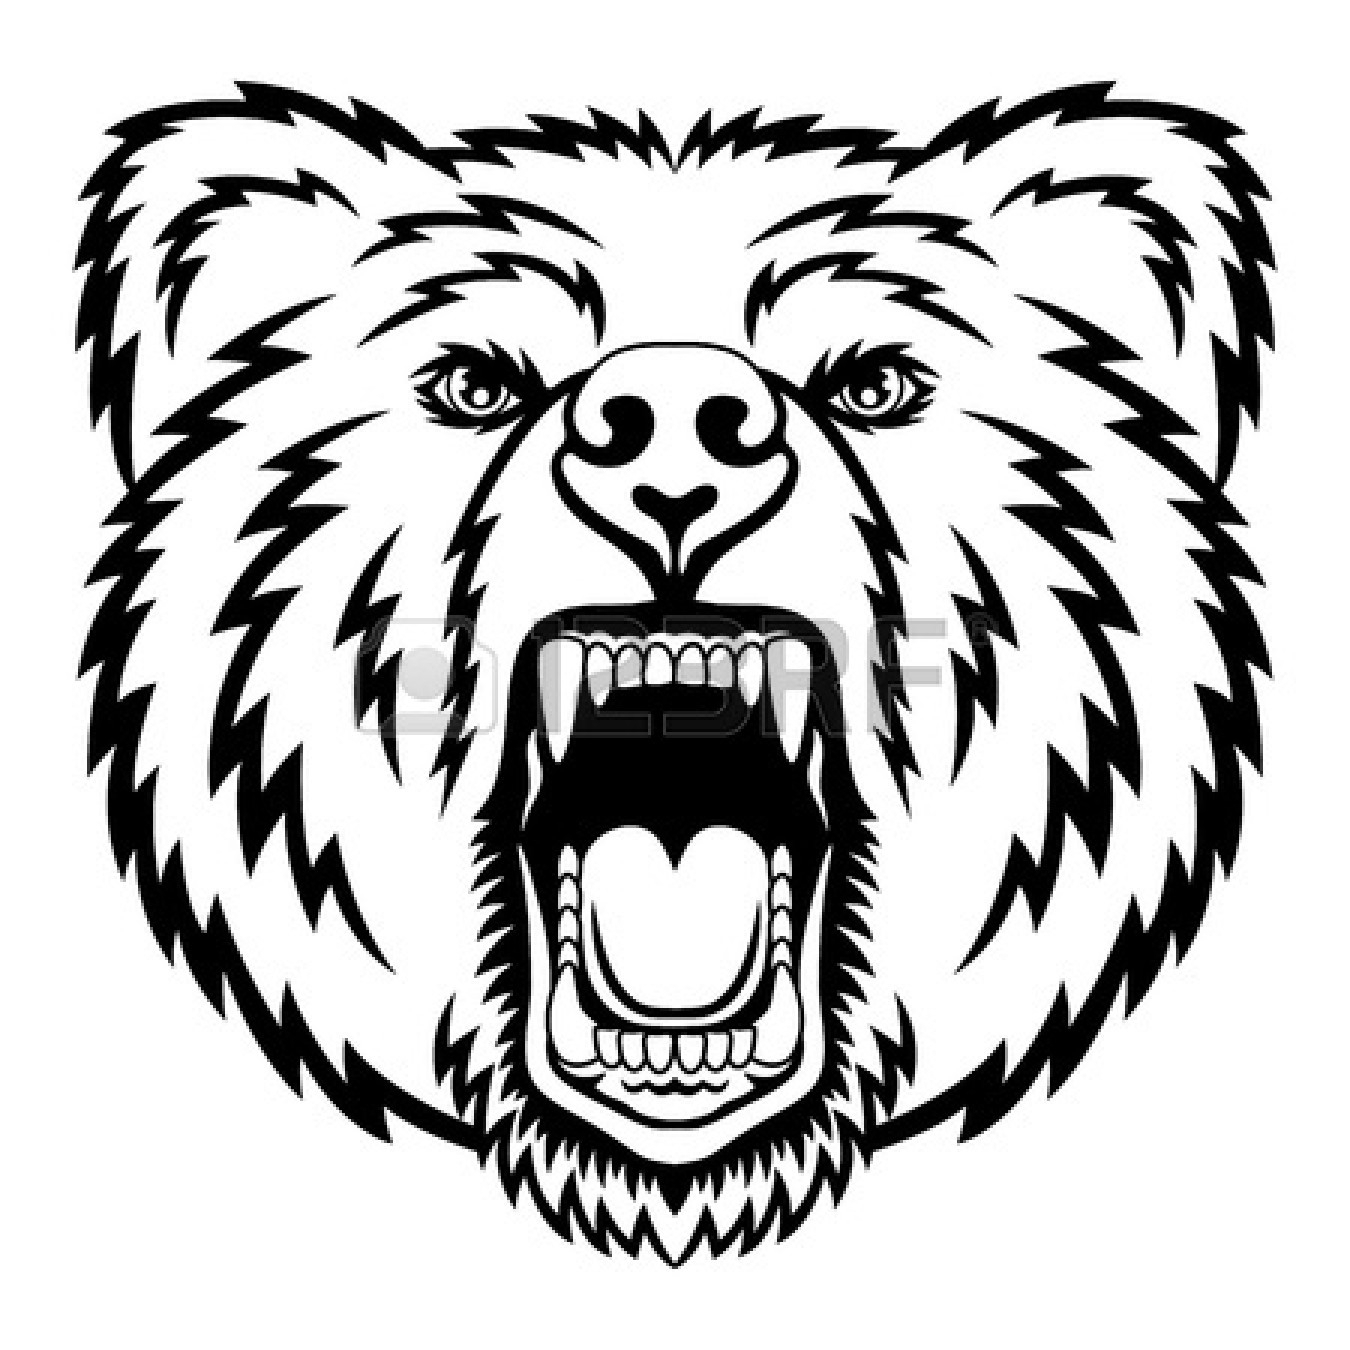 1350x1350 Grizzly Bear Head Drawing Drawn Grizzly Bear Bear Head